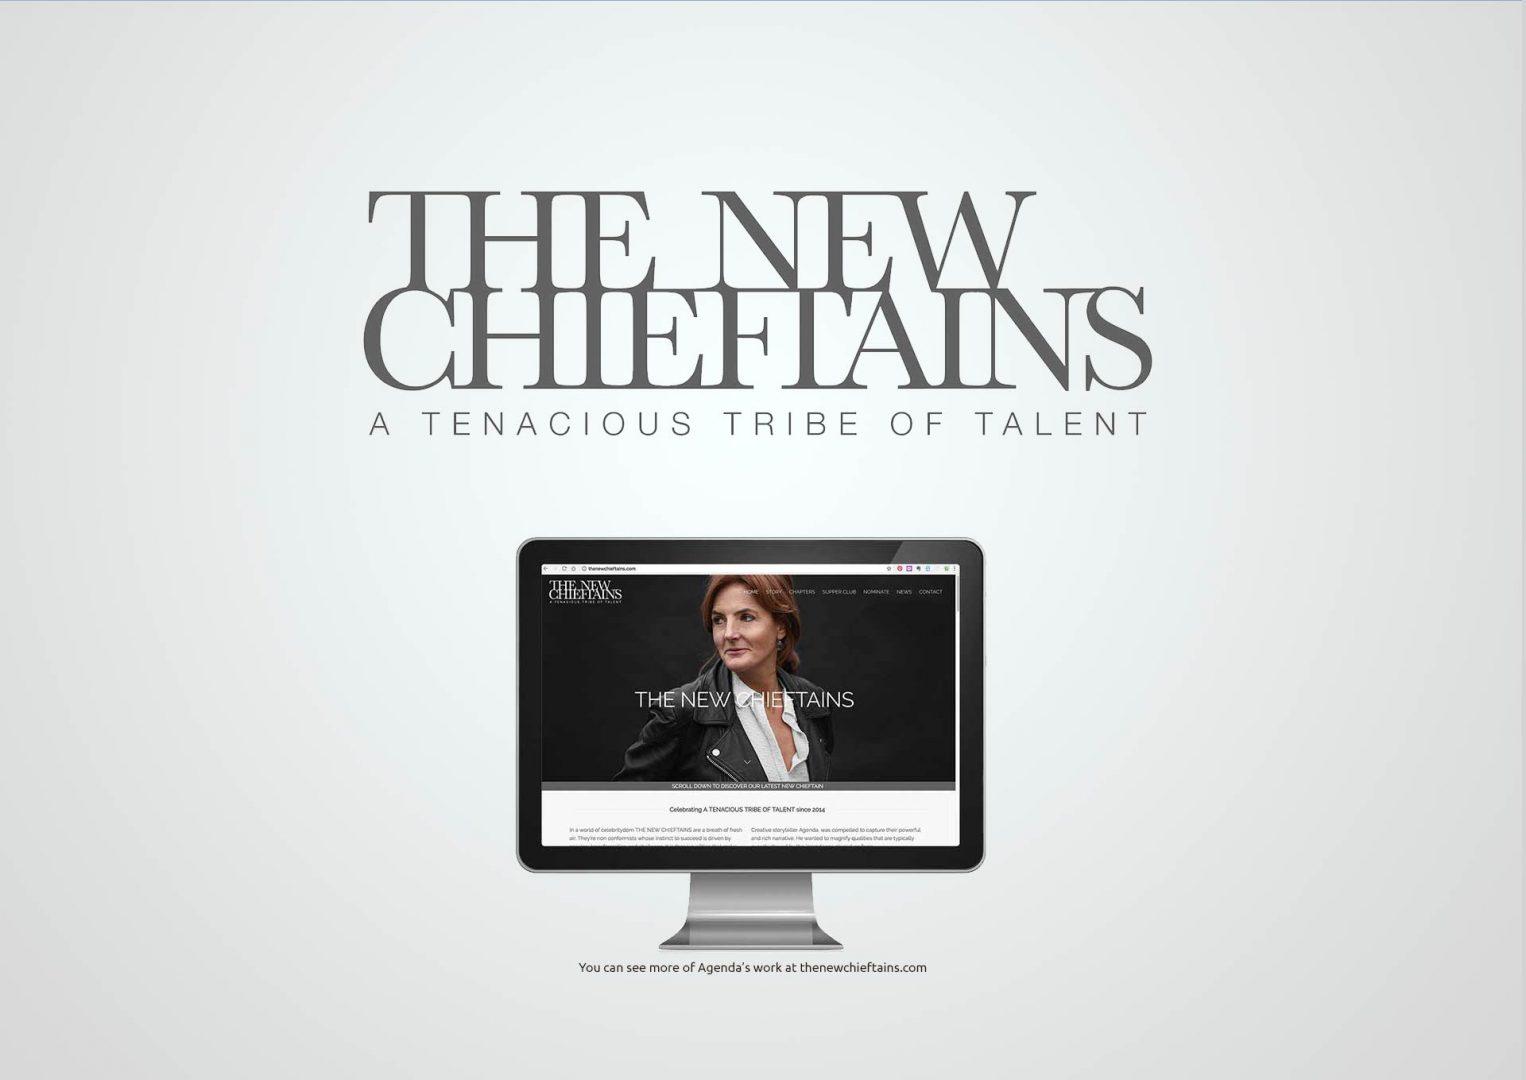 The New Chieftains, Logo design, Graphic Designer, Photoshop, Branding, Romford, Essex, Jan Lewis Creative